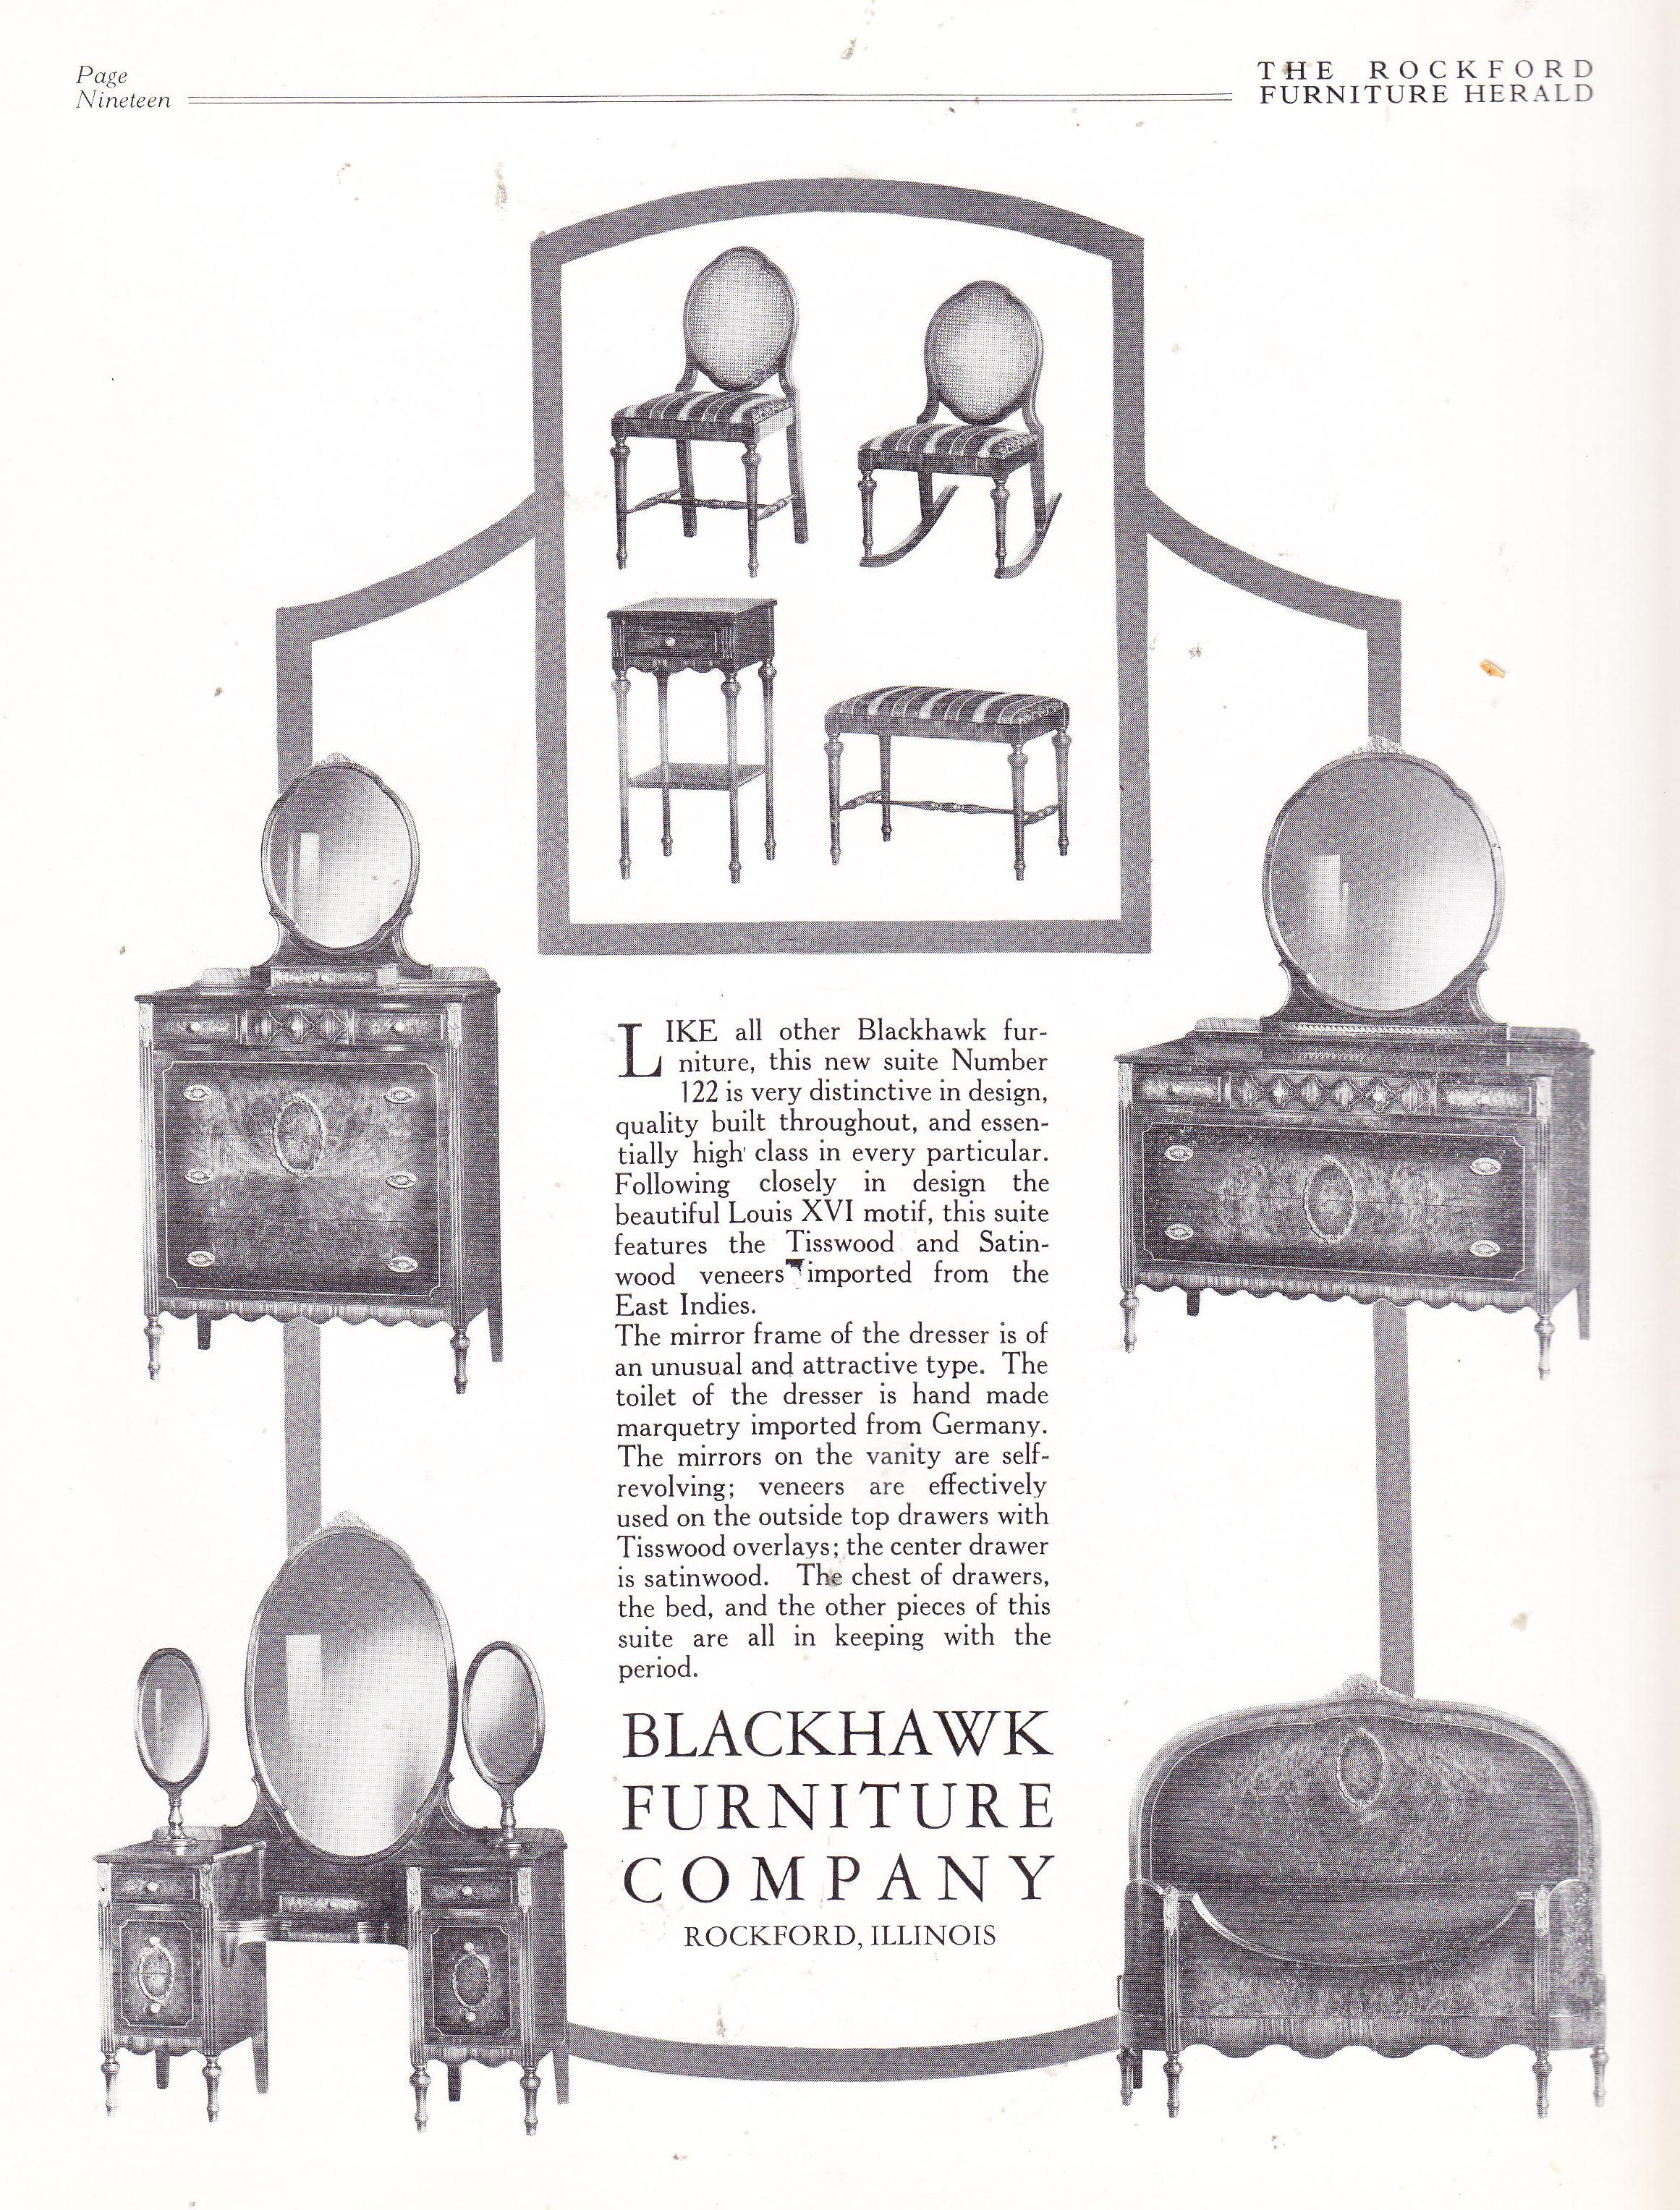 Charming Blackhawk Furniture Feb